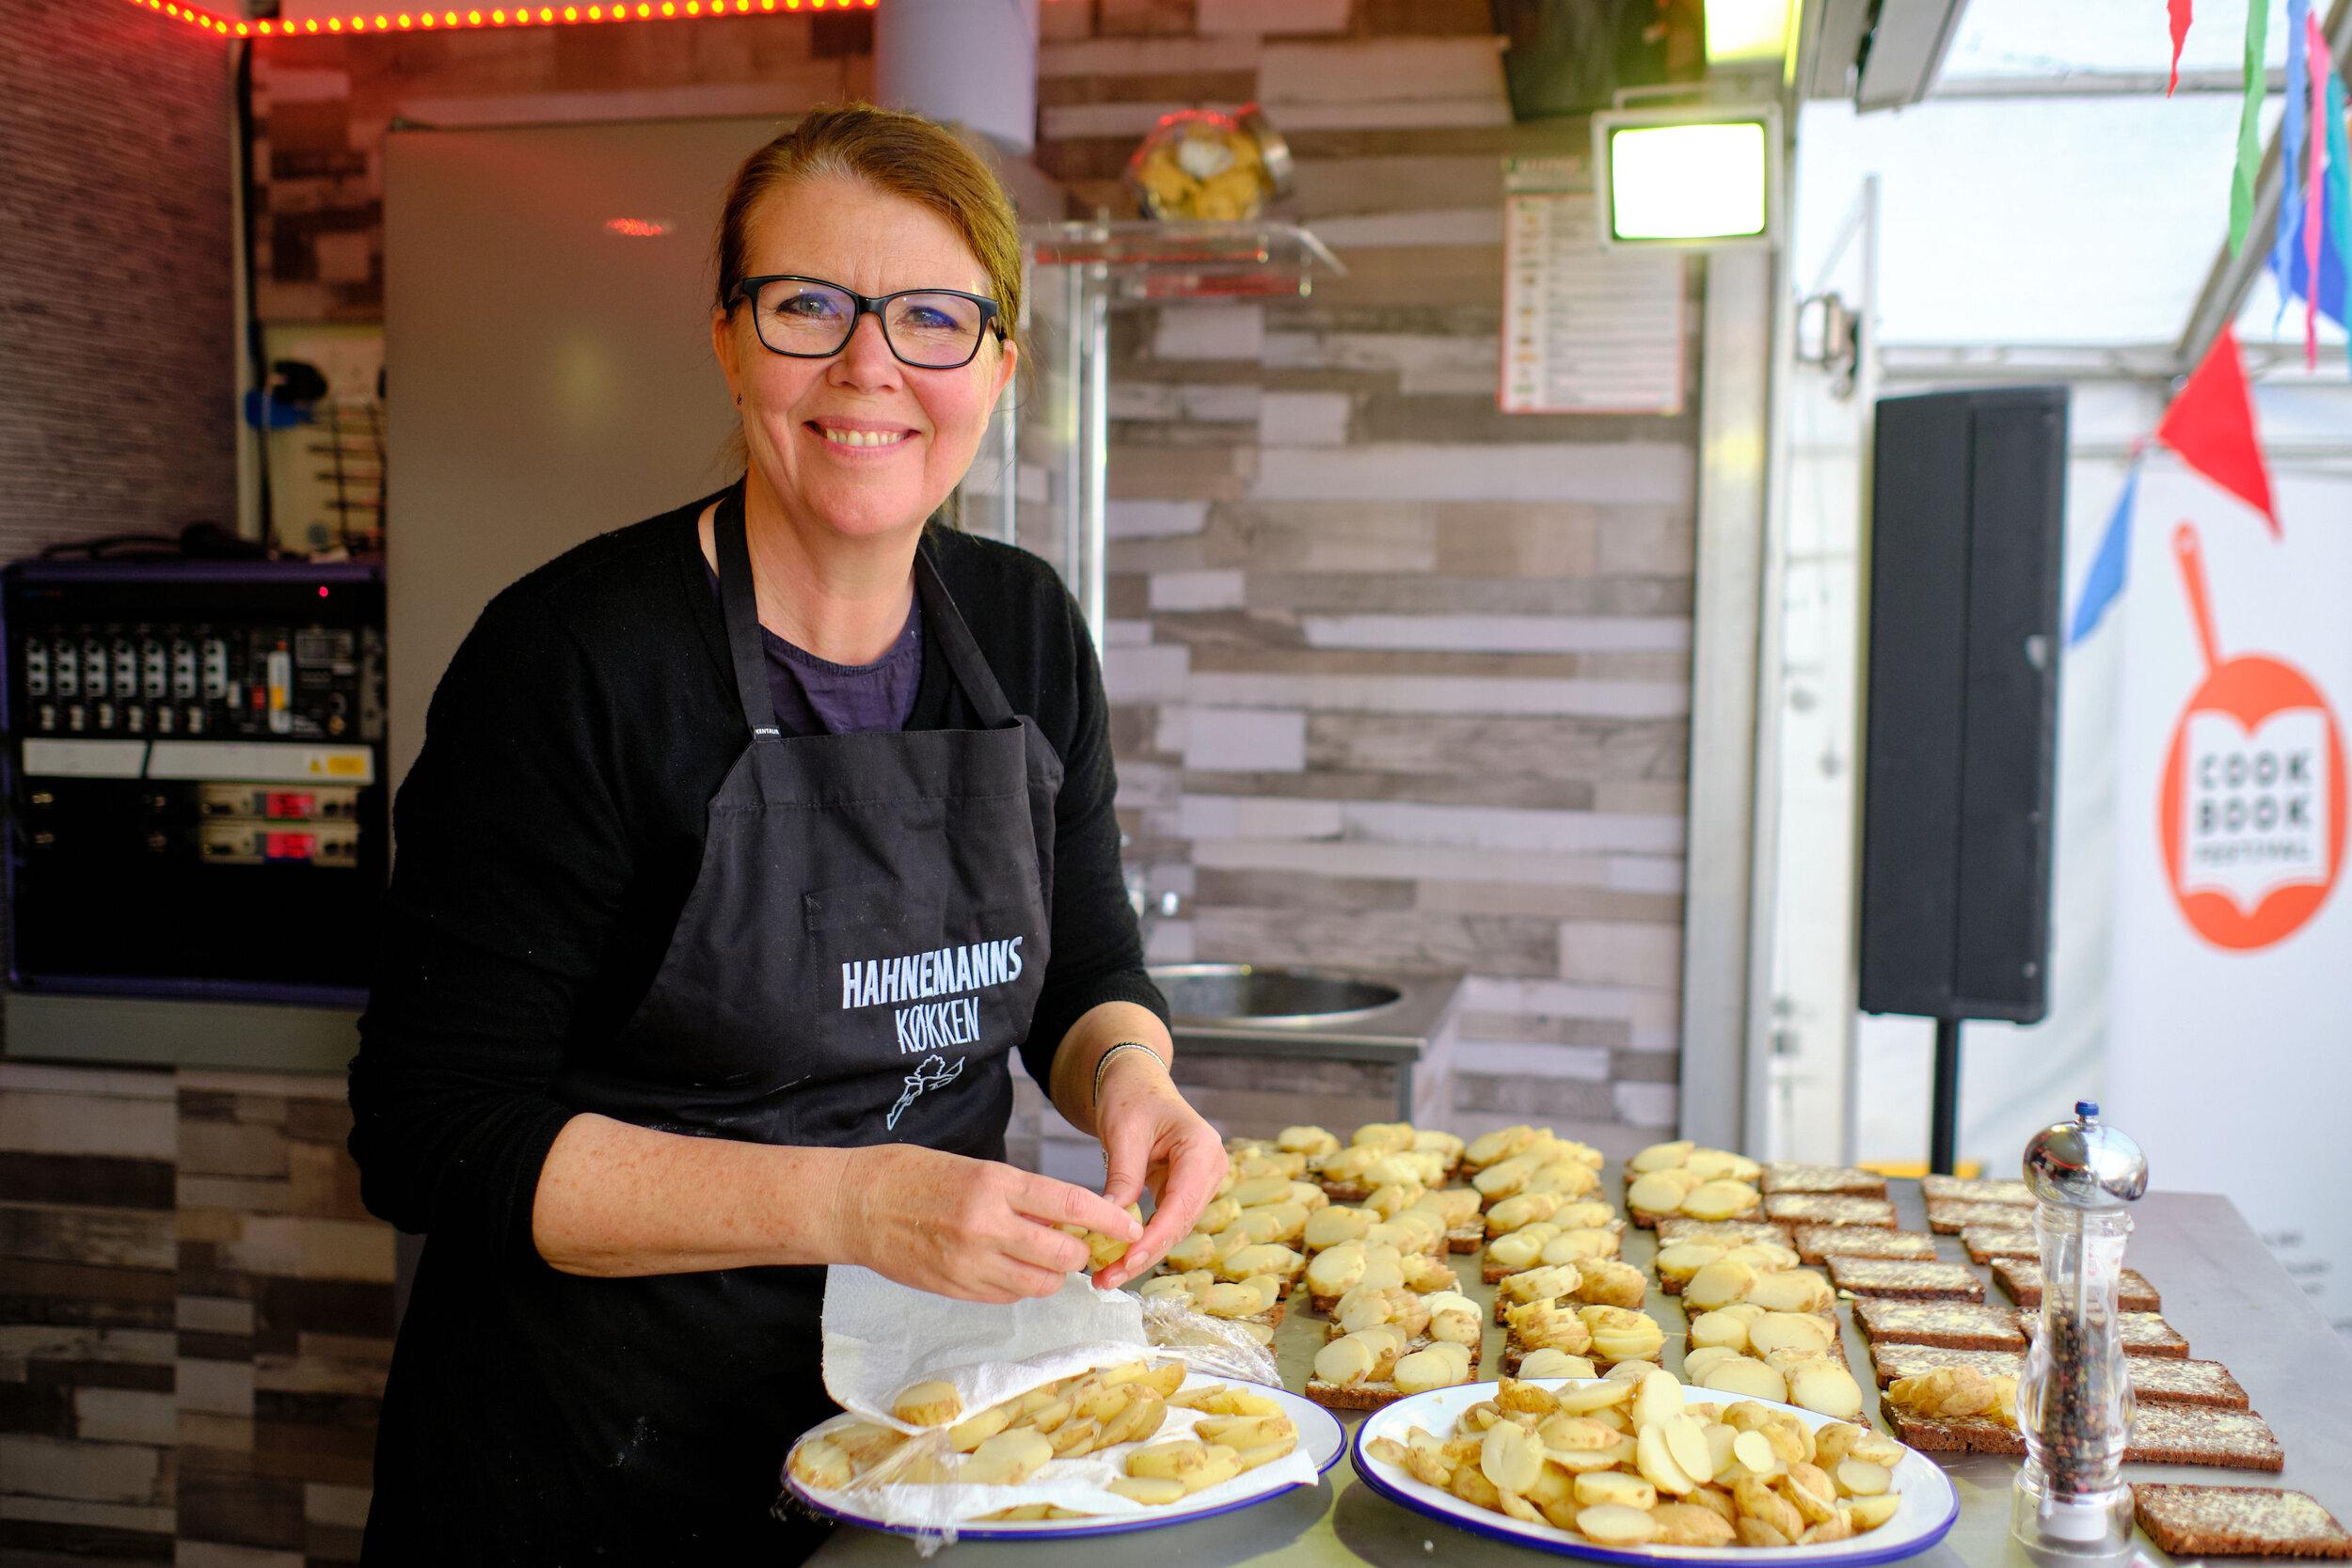 CookbookFestival20190117.jpg